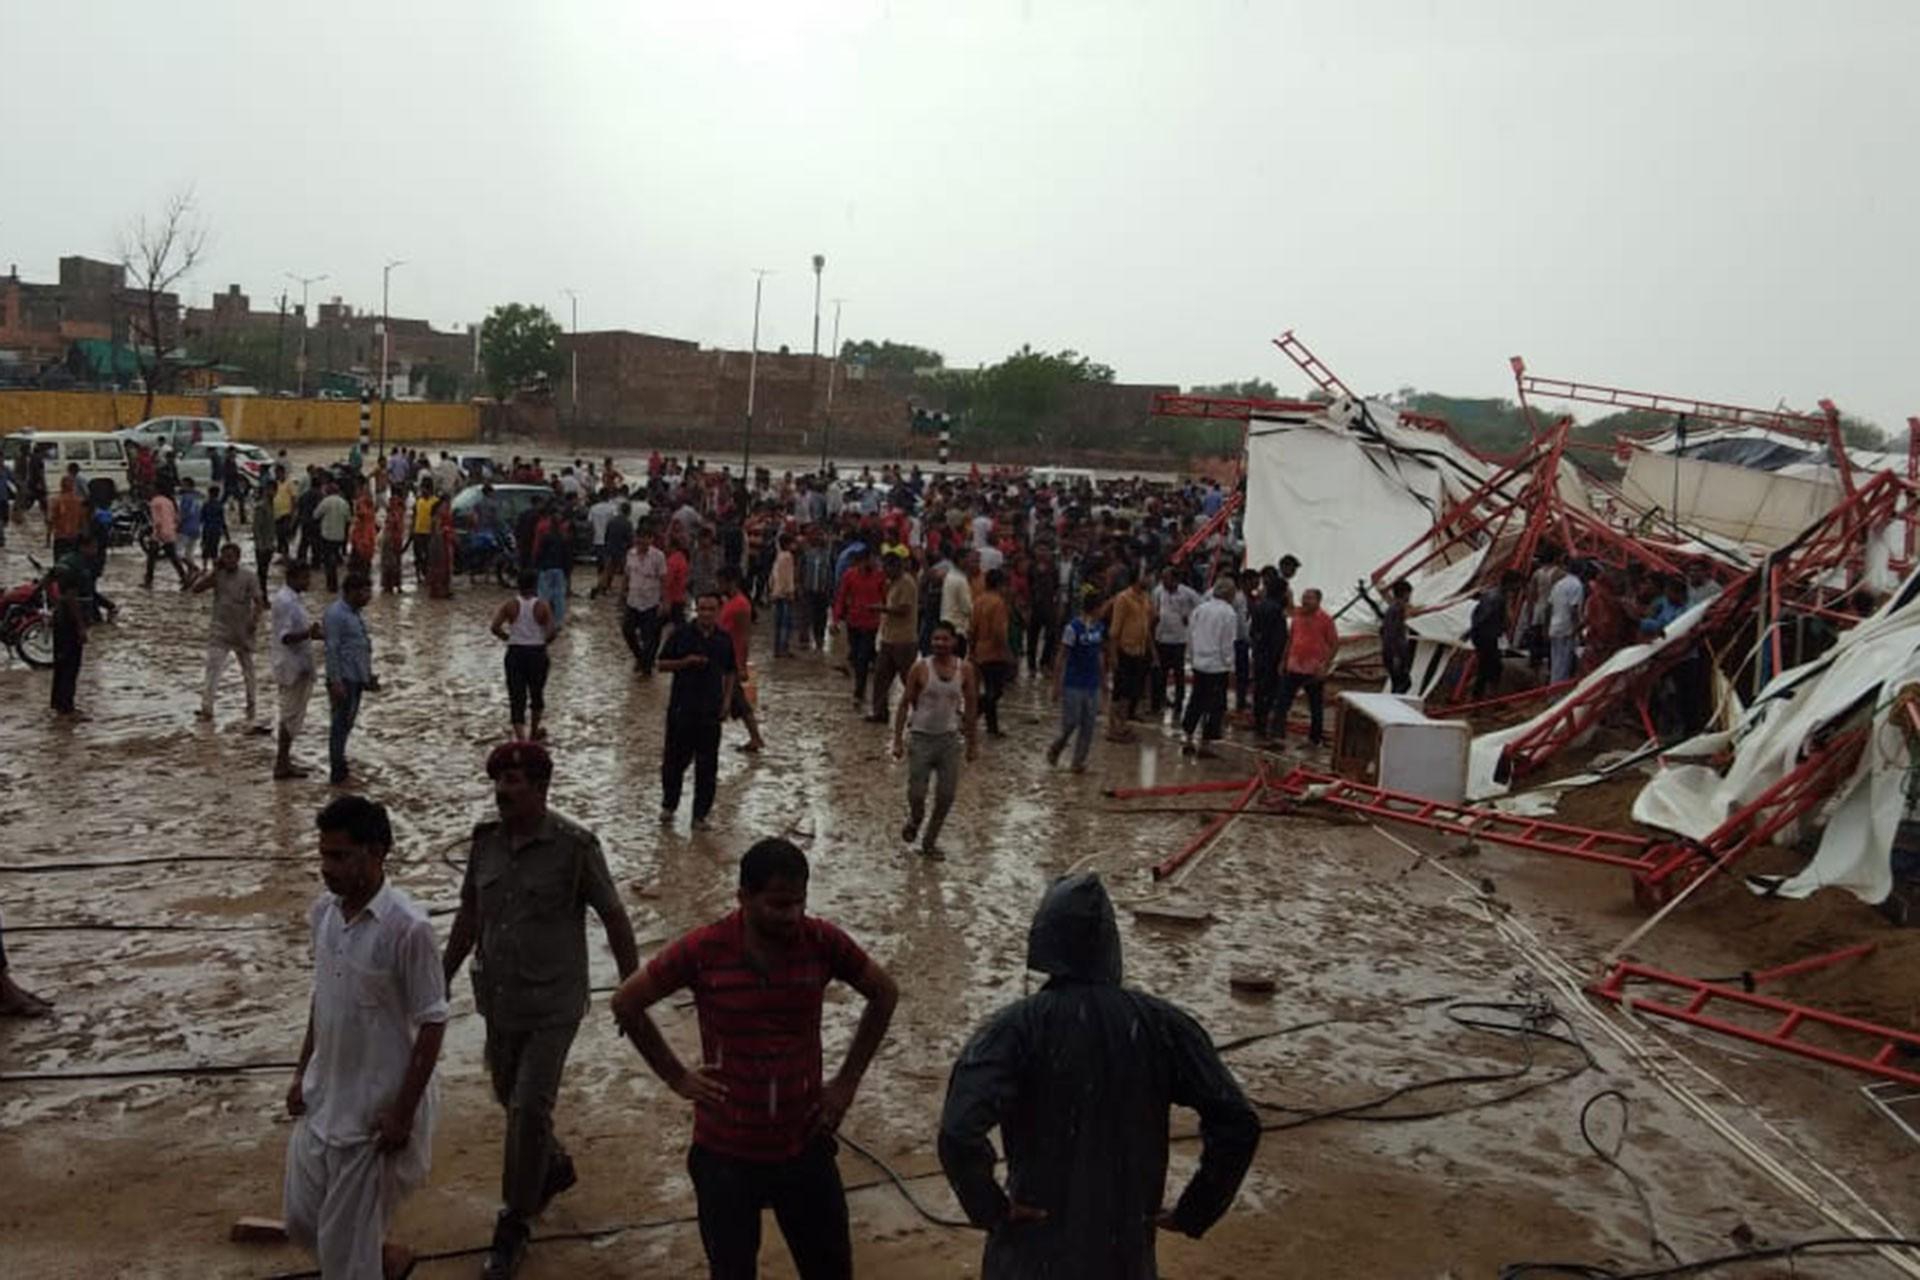 Hindistan'da pazar çadırı çöktü: 14 ölü